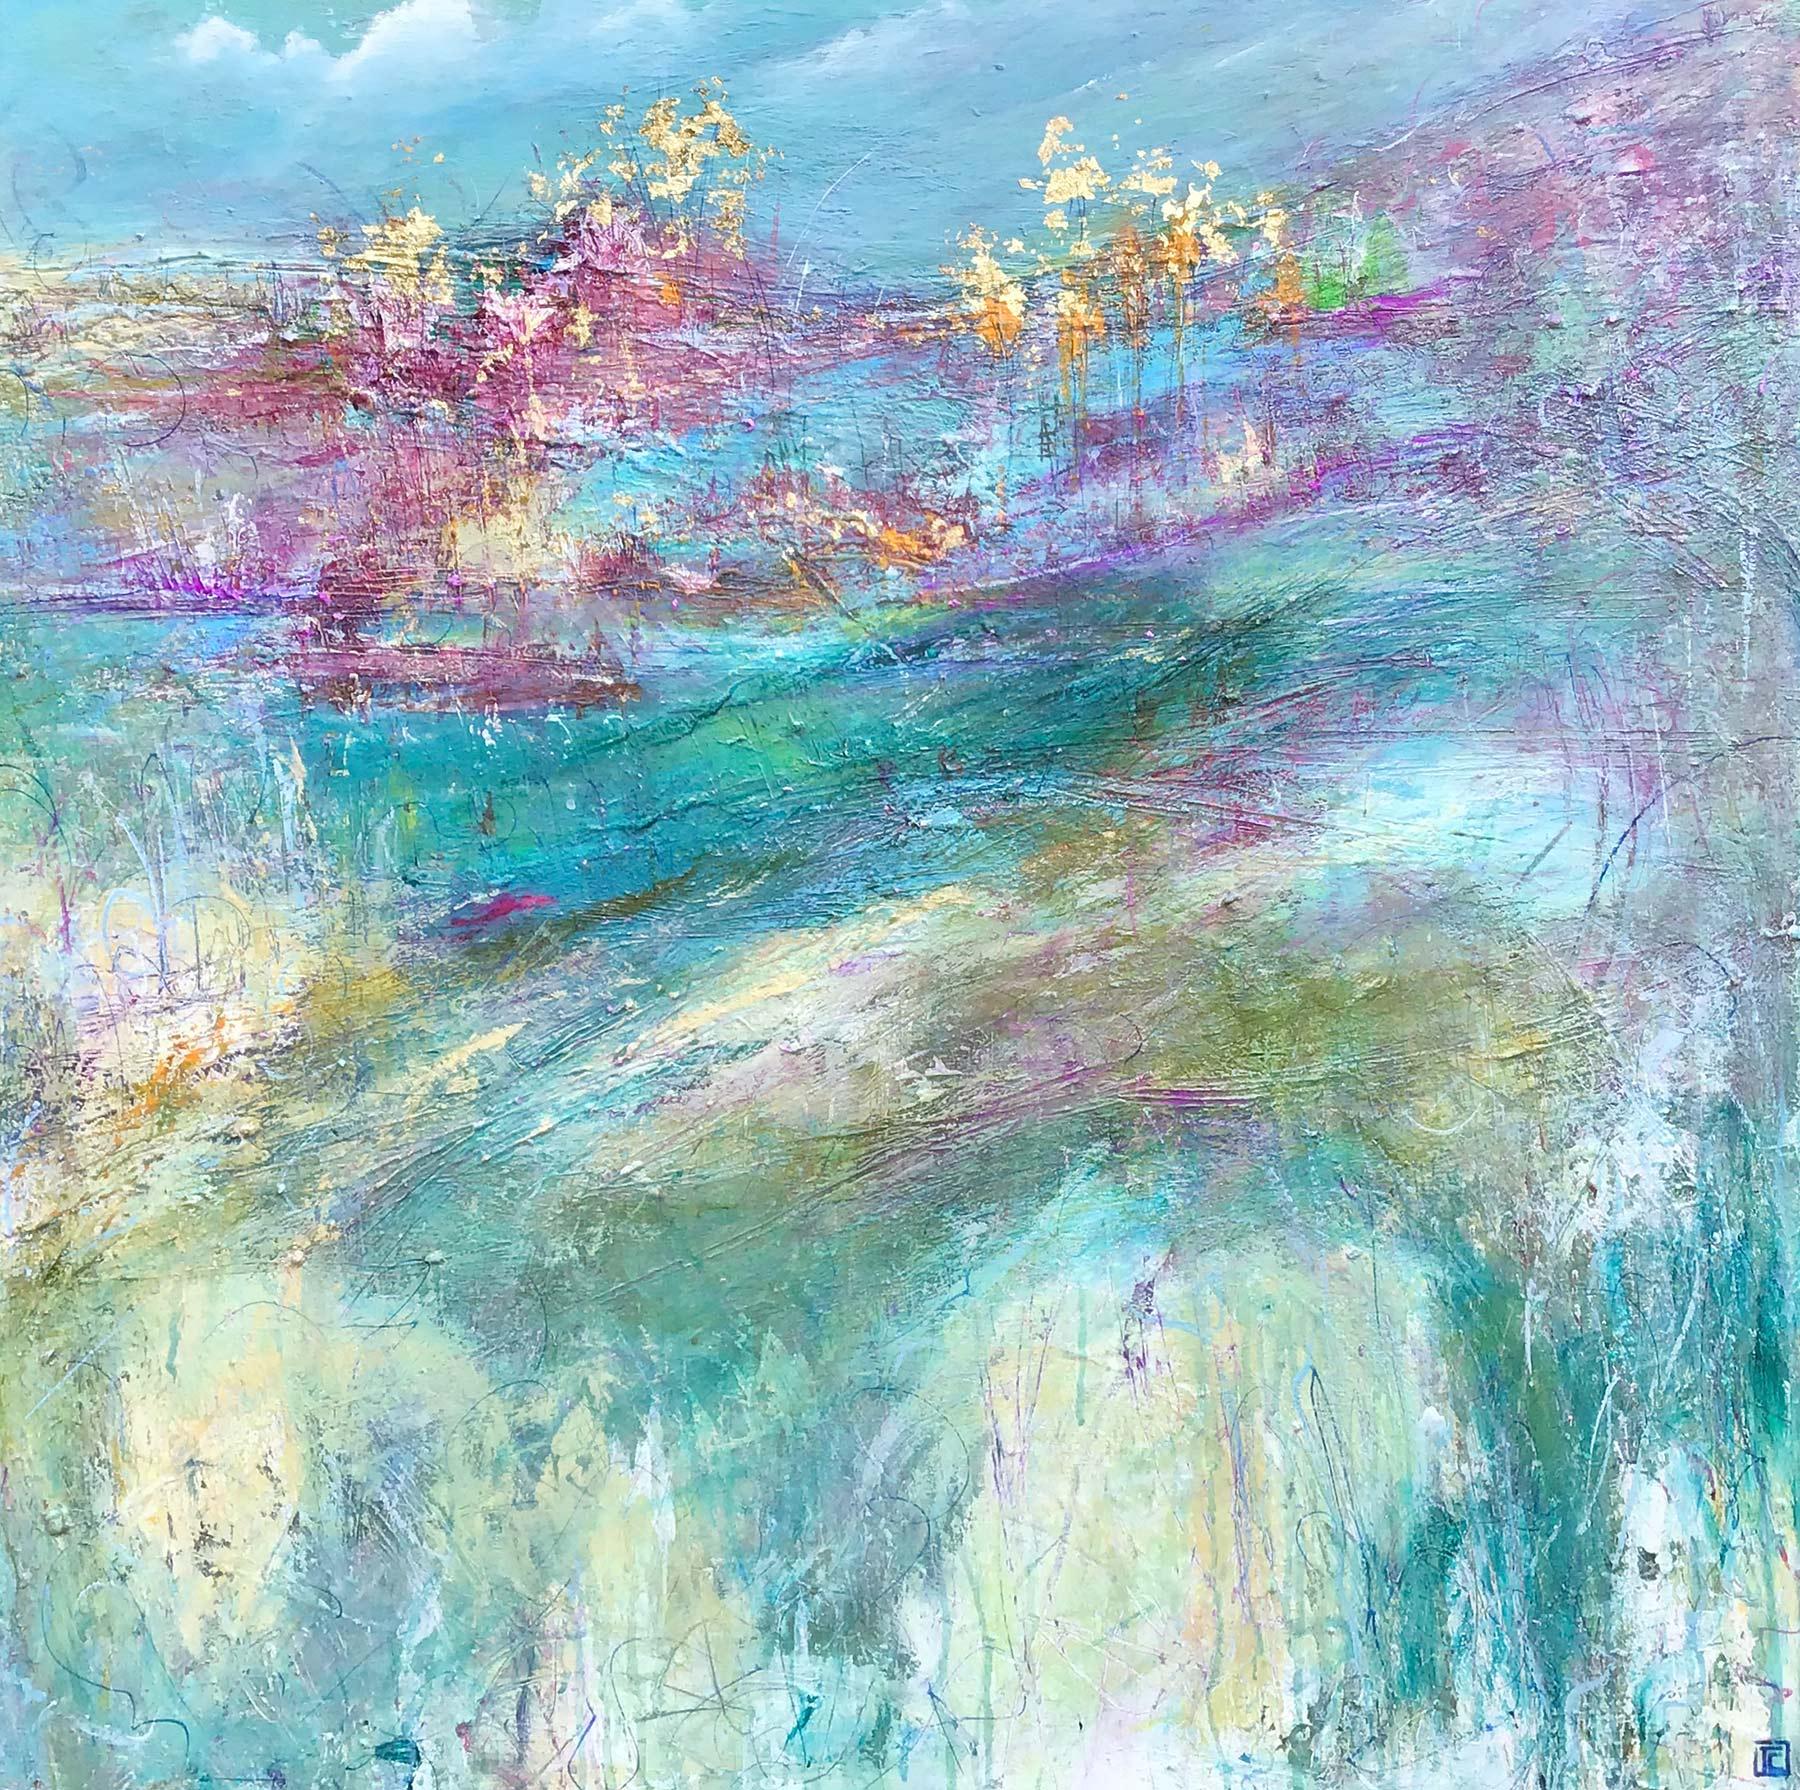 Tania Chanter Garden Mist